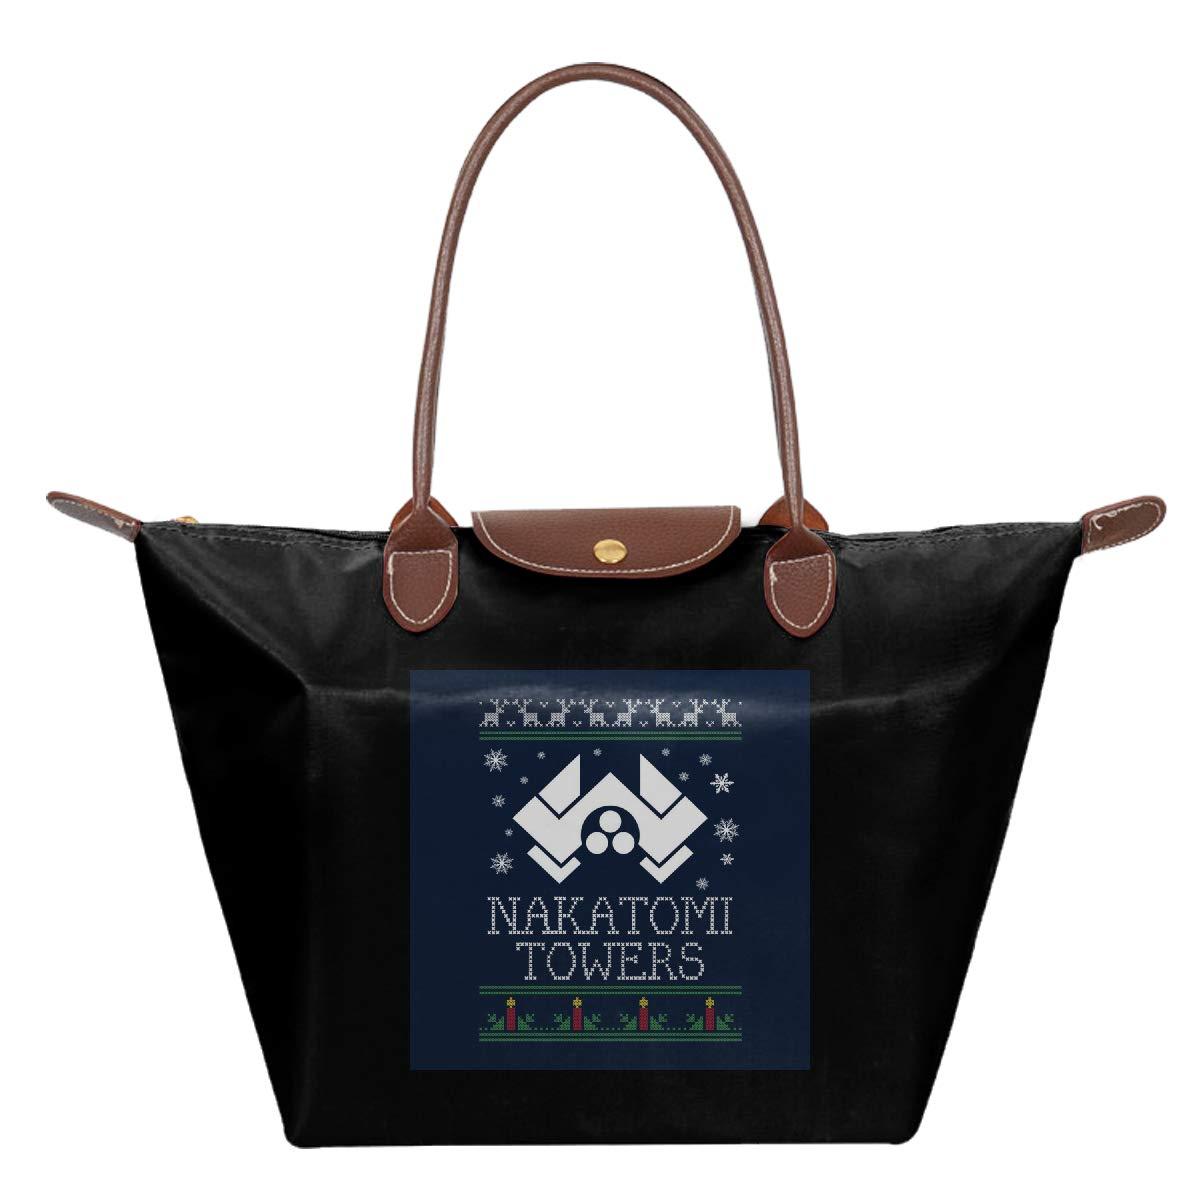 Die Hard Nakatomi Towers Christmas Waterproof Leather Folded Messenger Nylon Bag Travel Tote Hopping Folding School Handbags